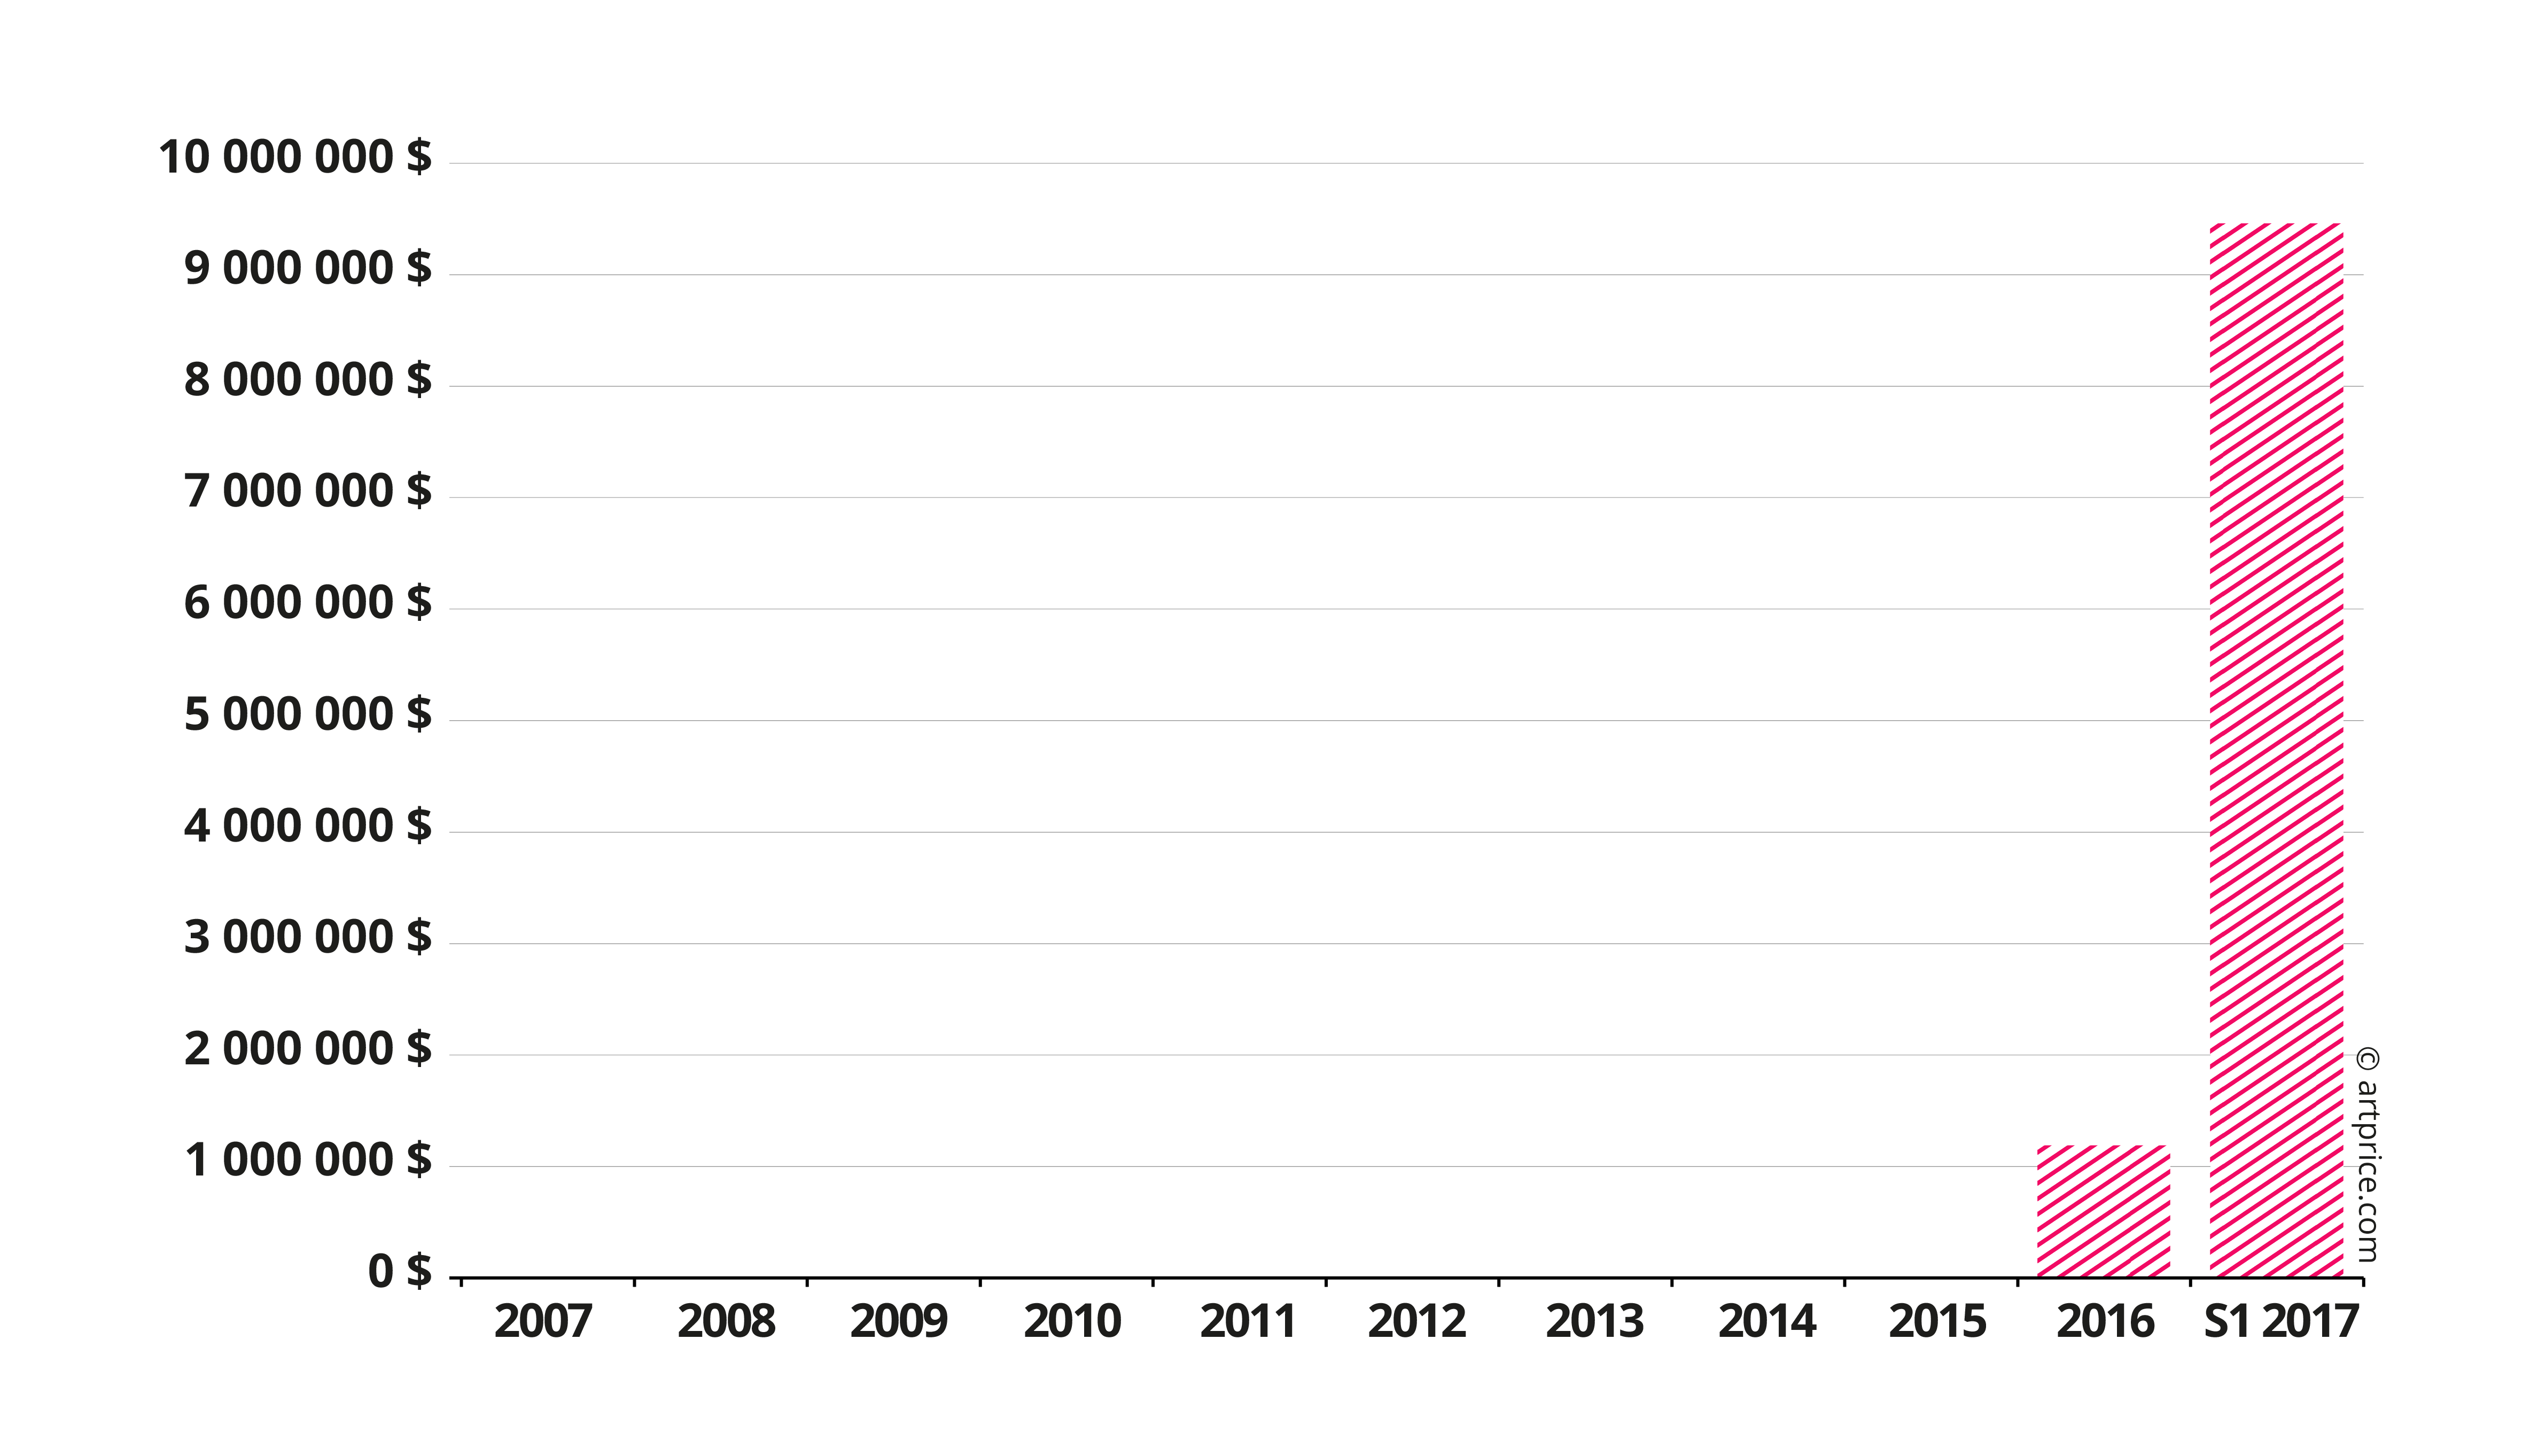 Evolution du produit des ventes de Njideka Akunyili Crosby